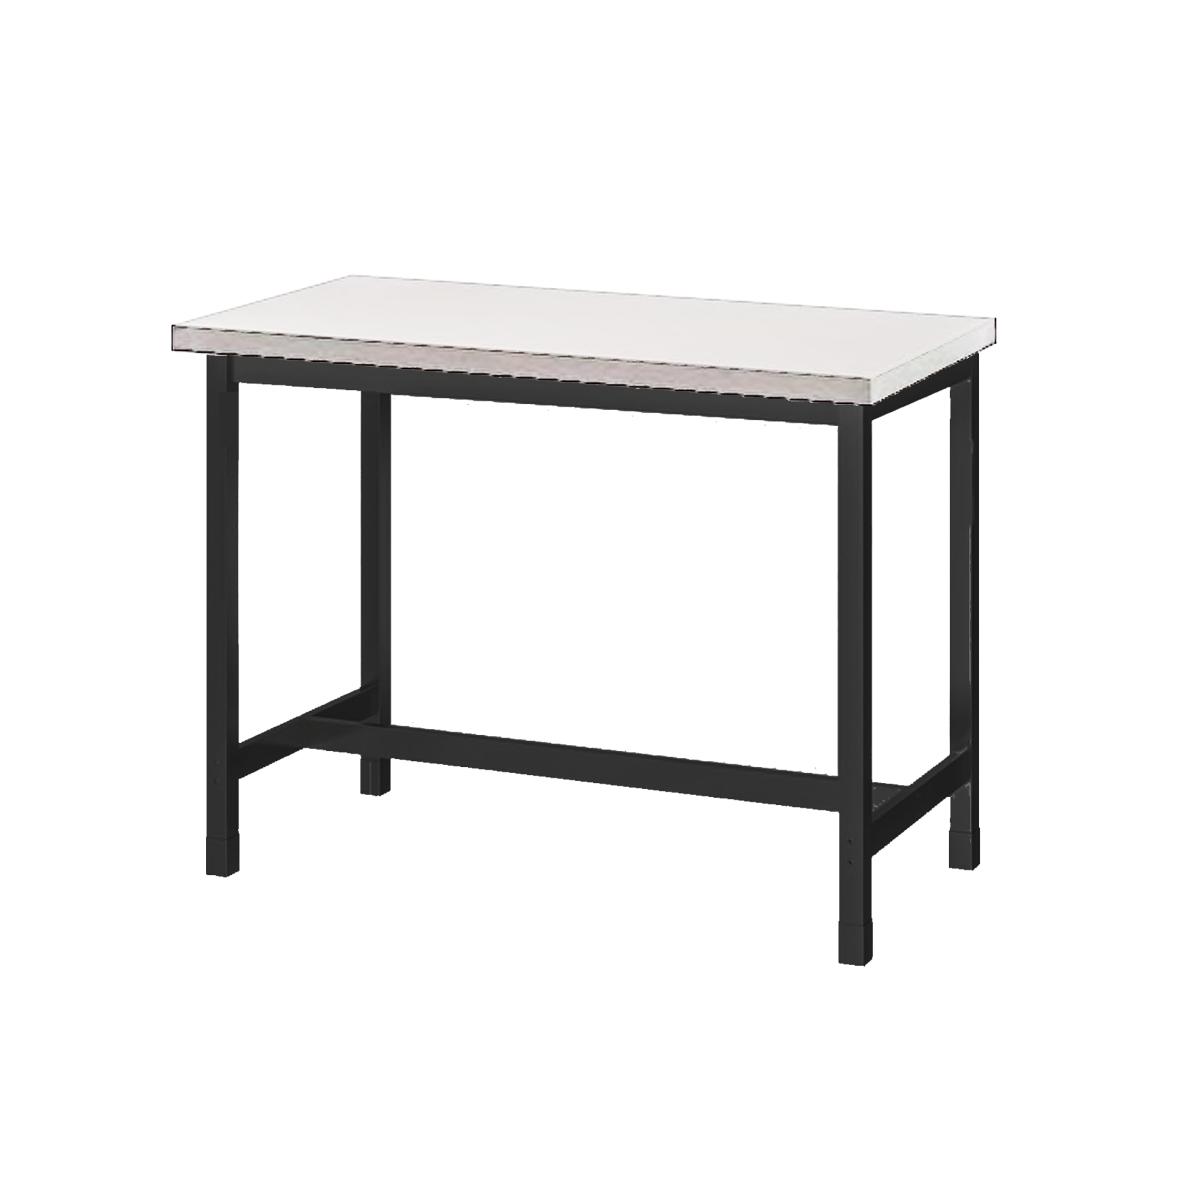 White Urban Communal Table $100